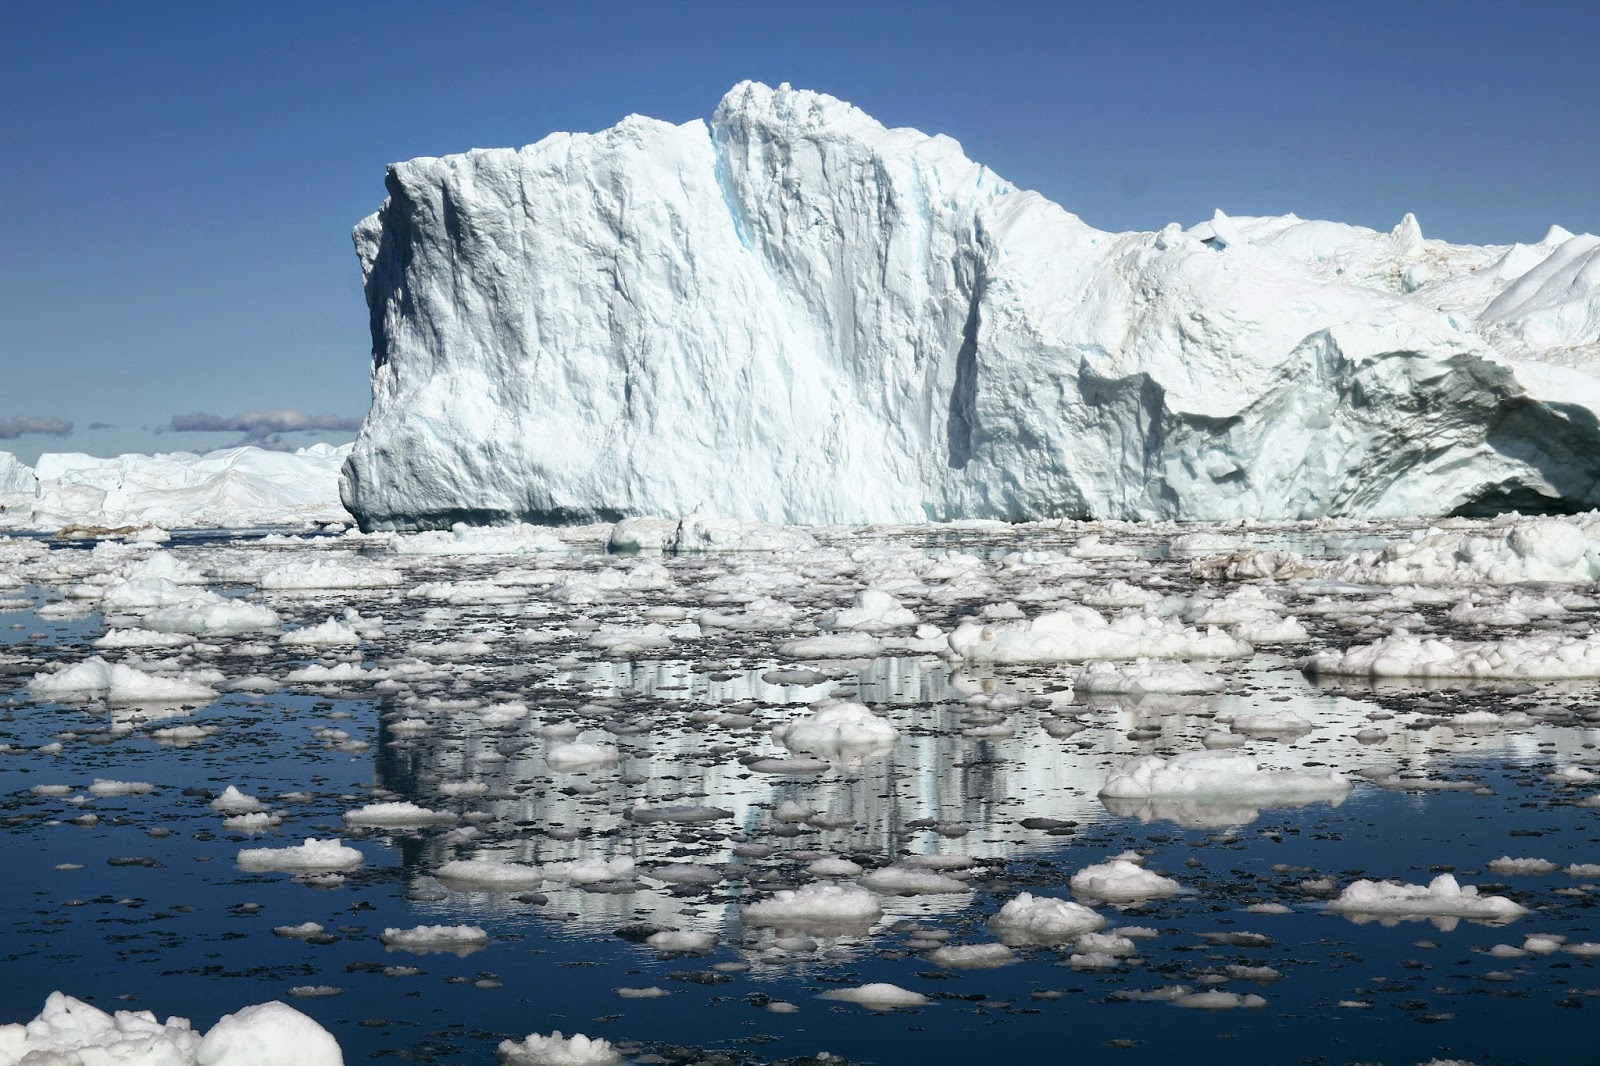 O GLACIAR ILULISSAT KANGERLUA - O mundo dos gelos polares no Fiorde Gelado de Ilulissat | Gronelândia